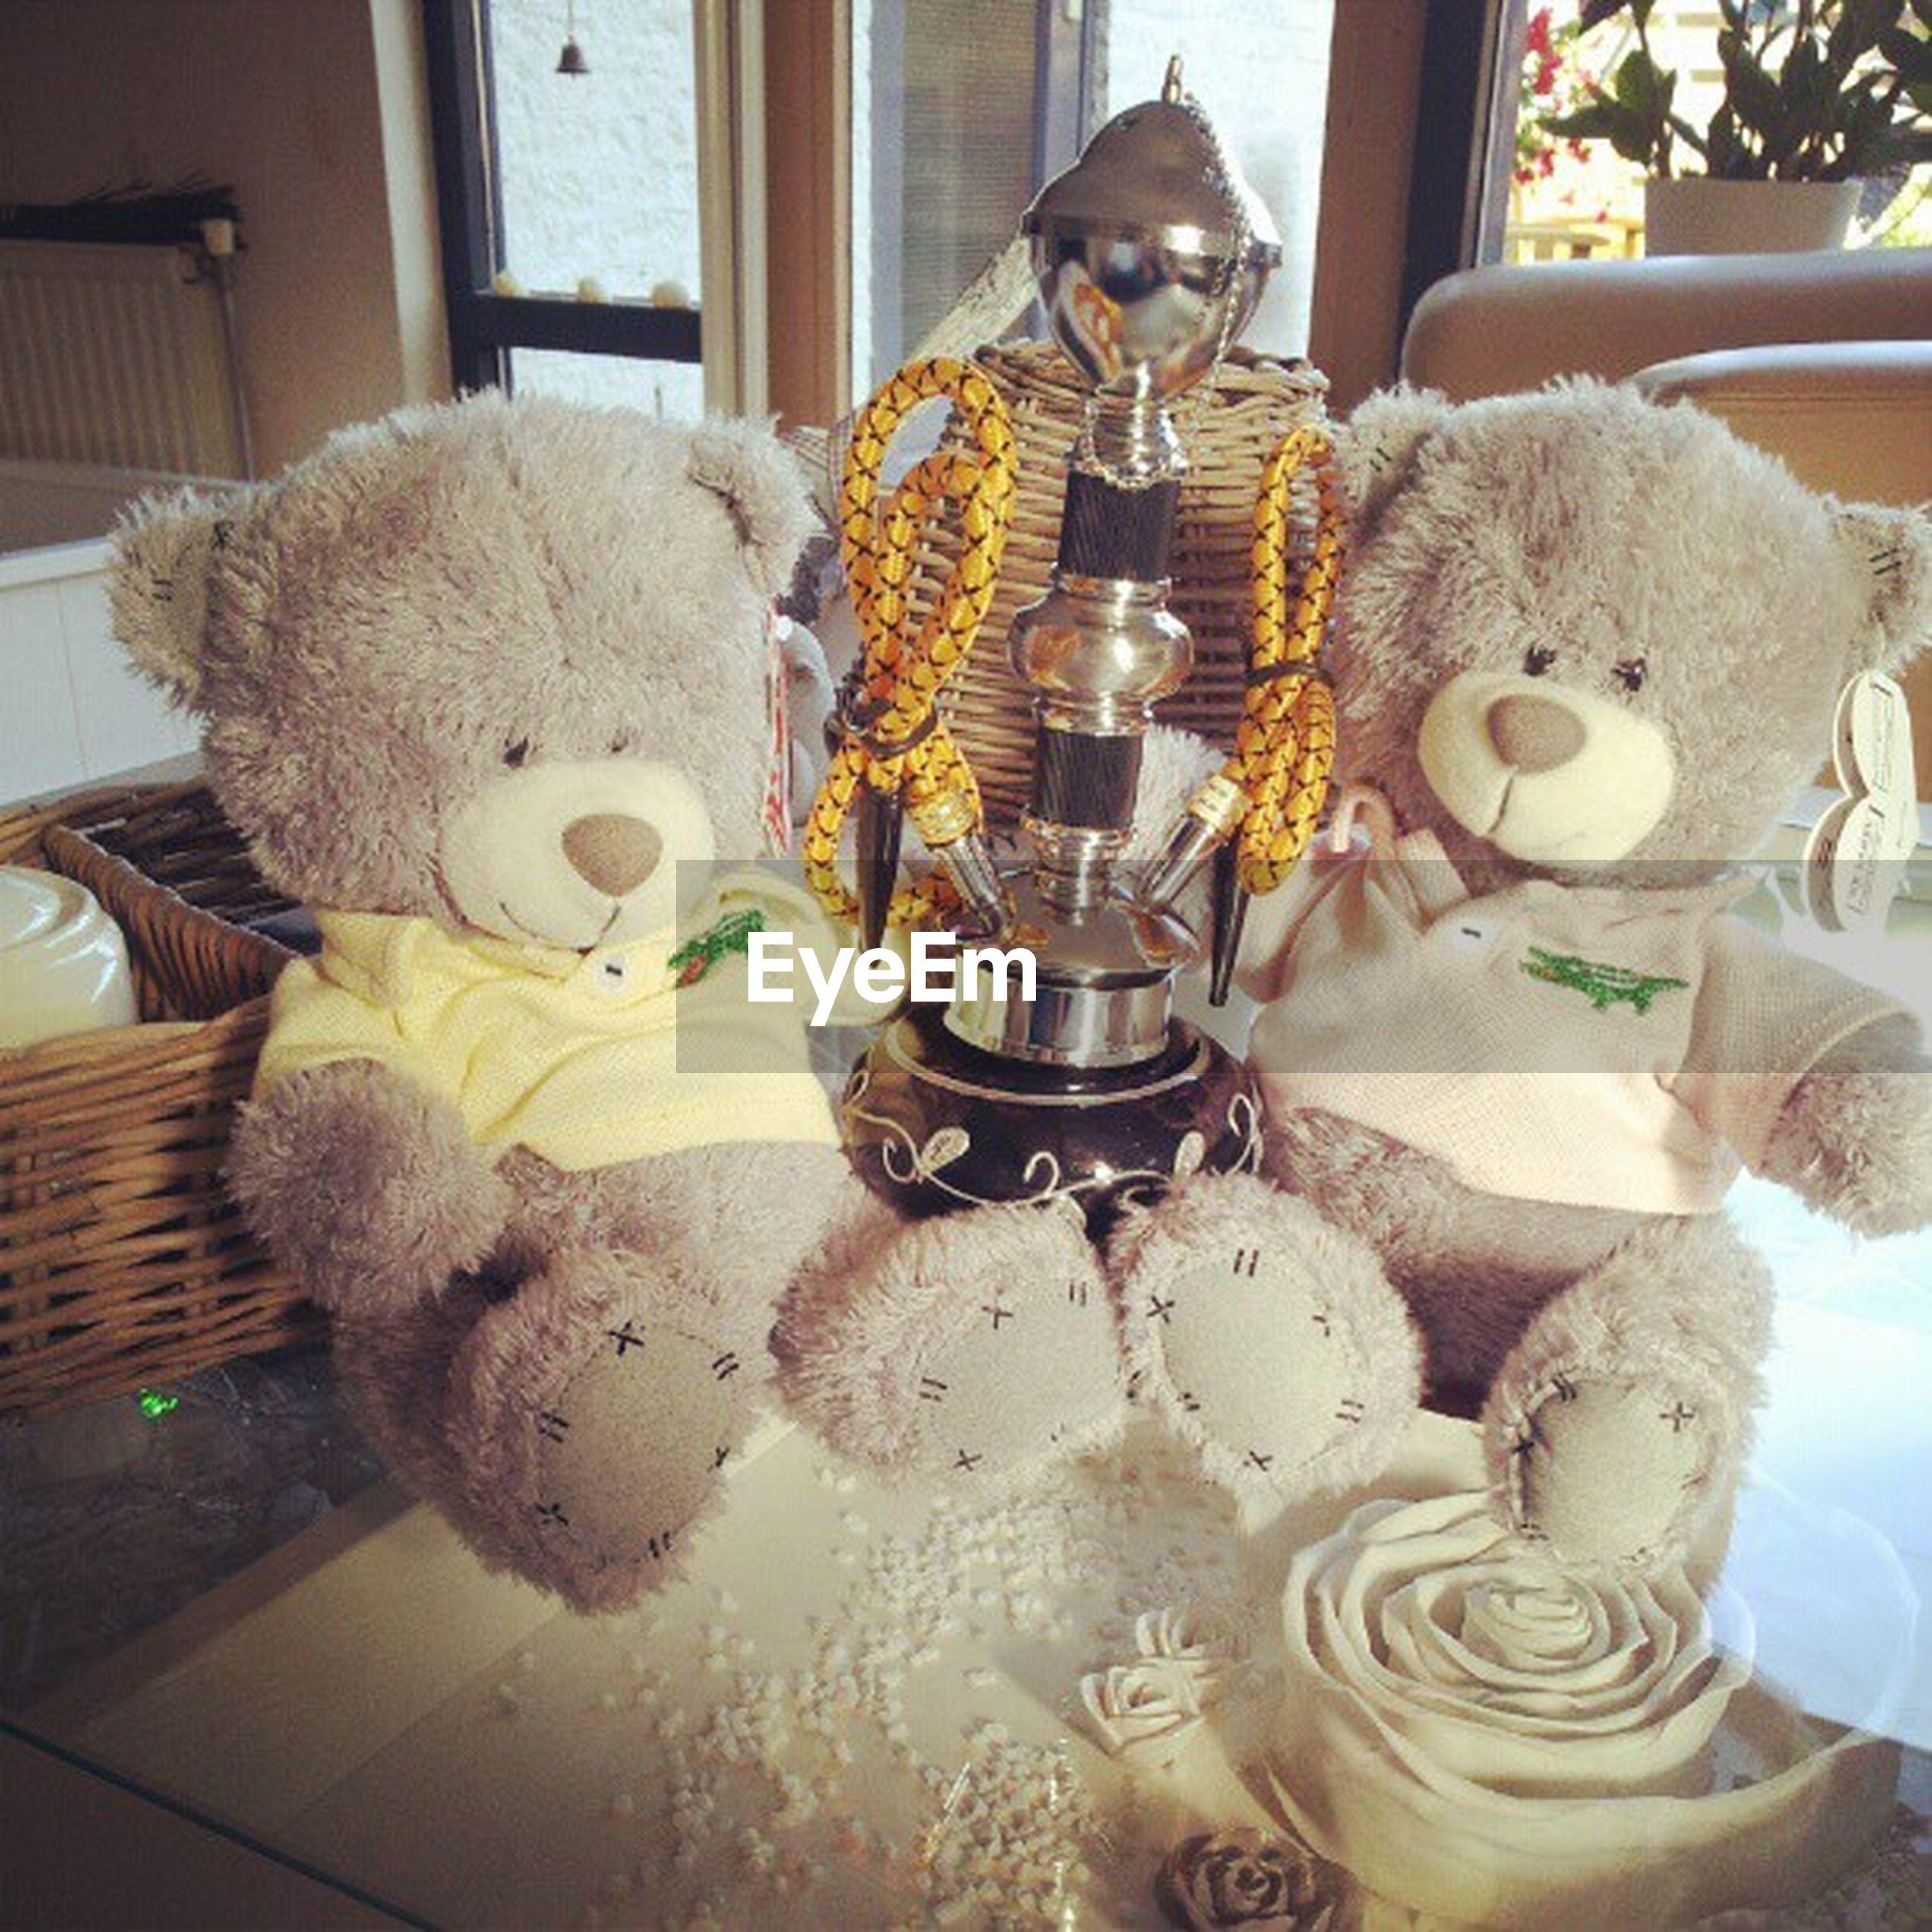 indoors, home interior, animal representation, toy, human representation, stuffed toy, art and craft, art, table, still life, decoration, creativity, teddy bear, figurine, no people, statue, sculpture, christmas